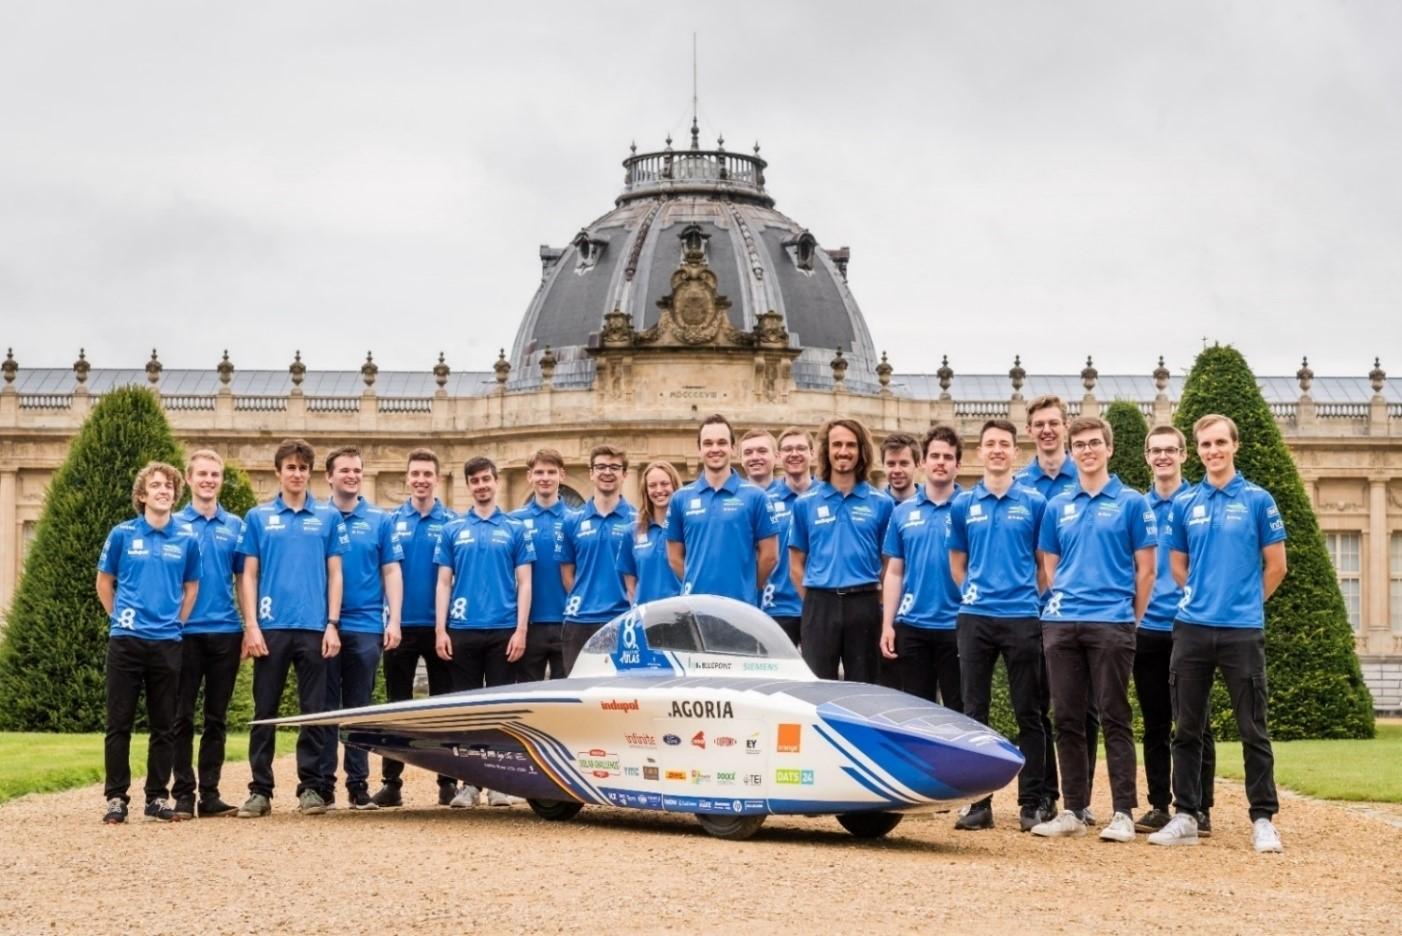 2021-Agoria-Solar-Team